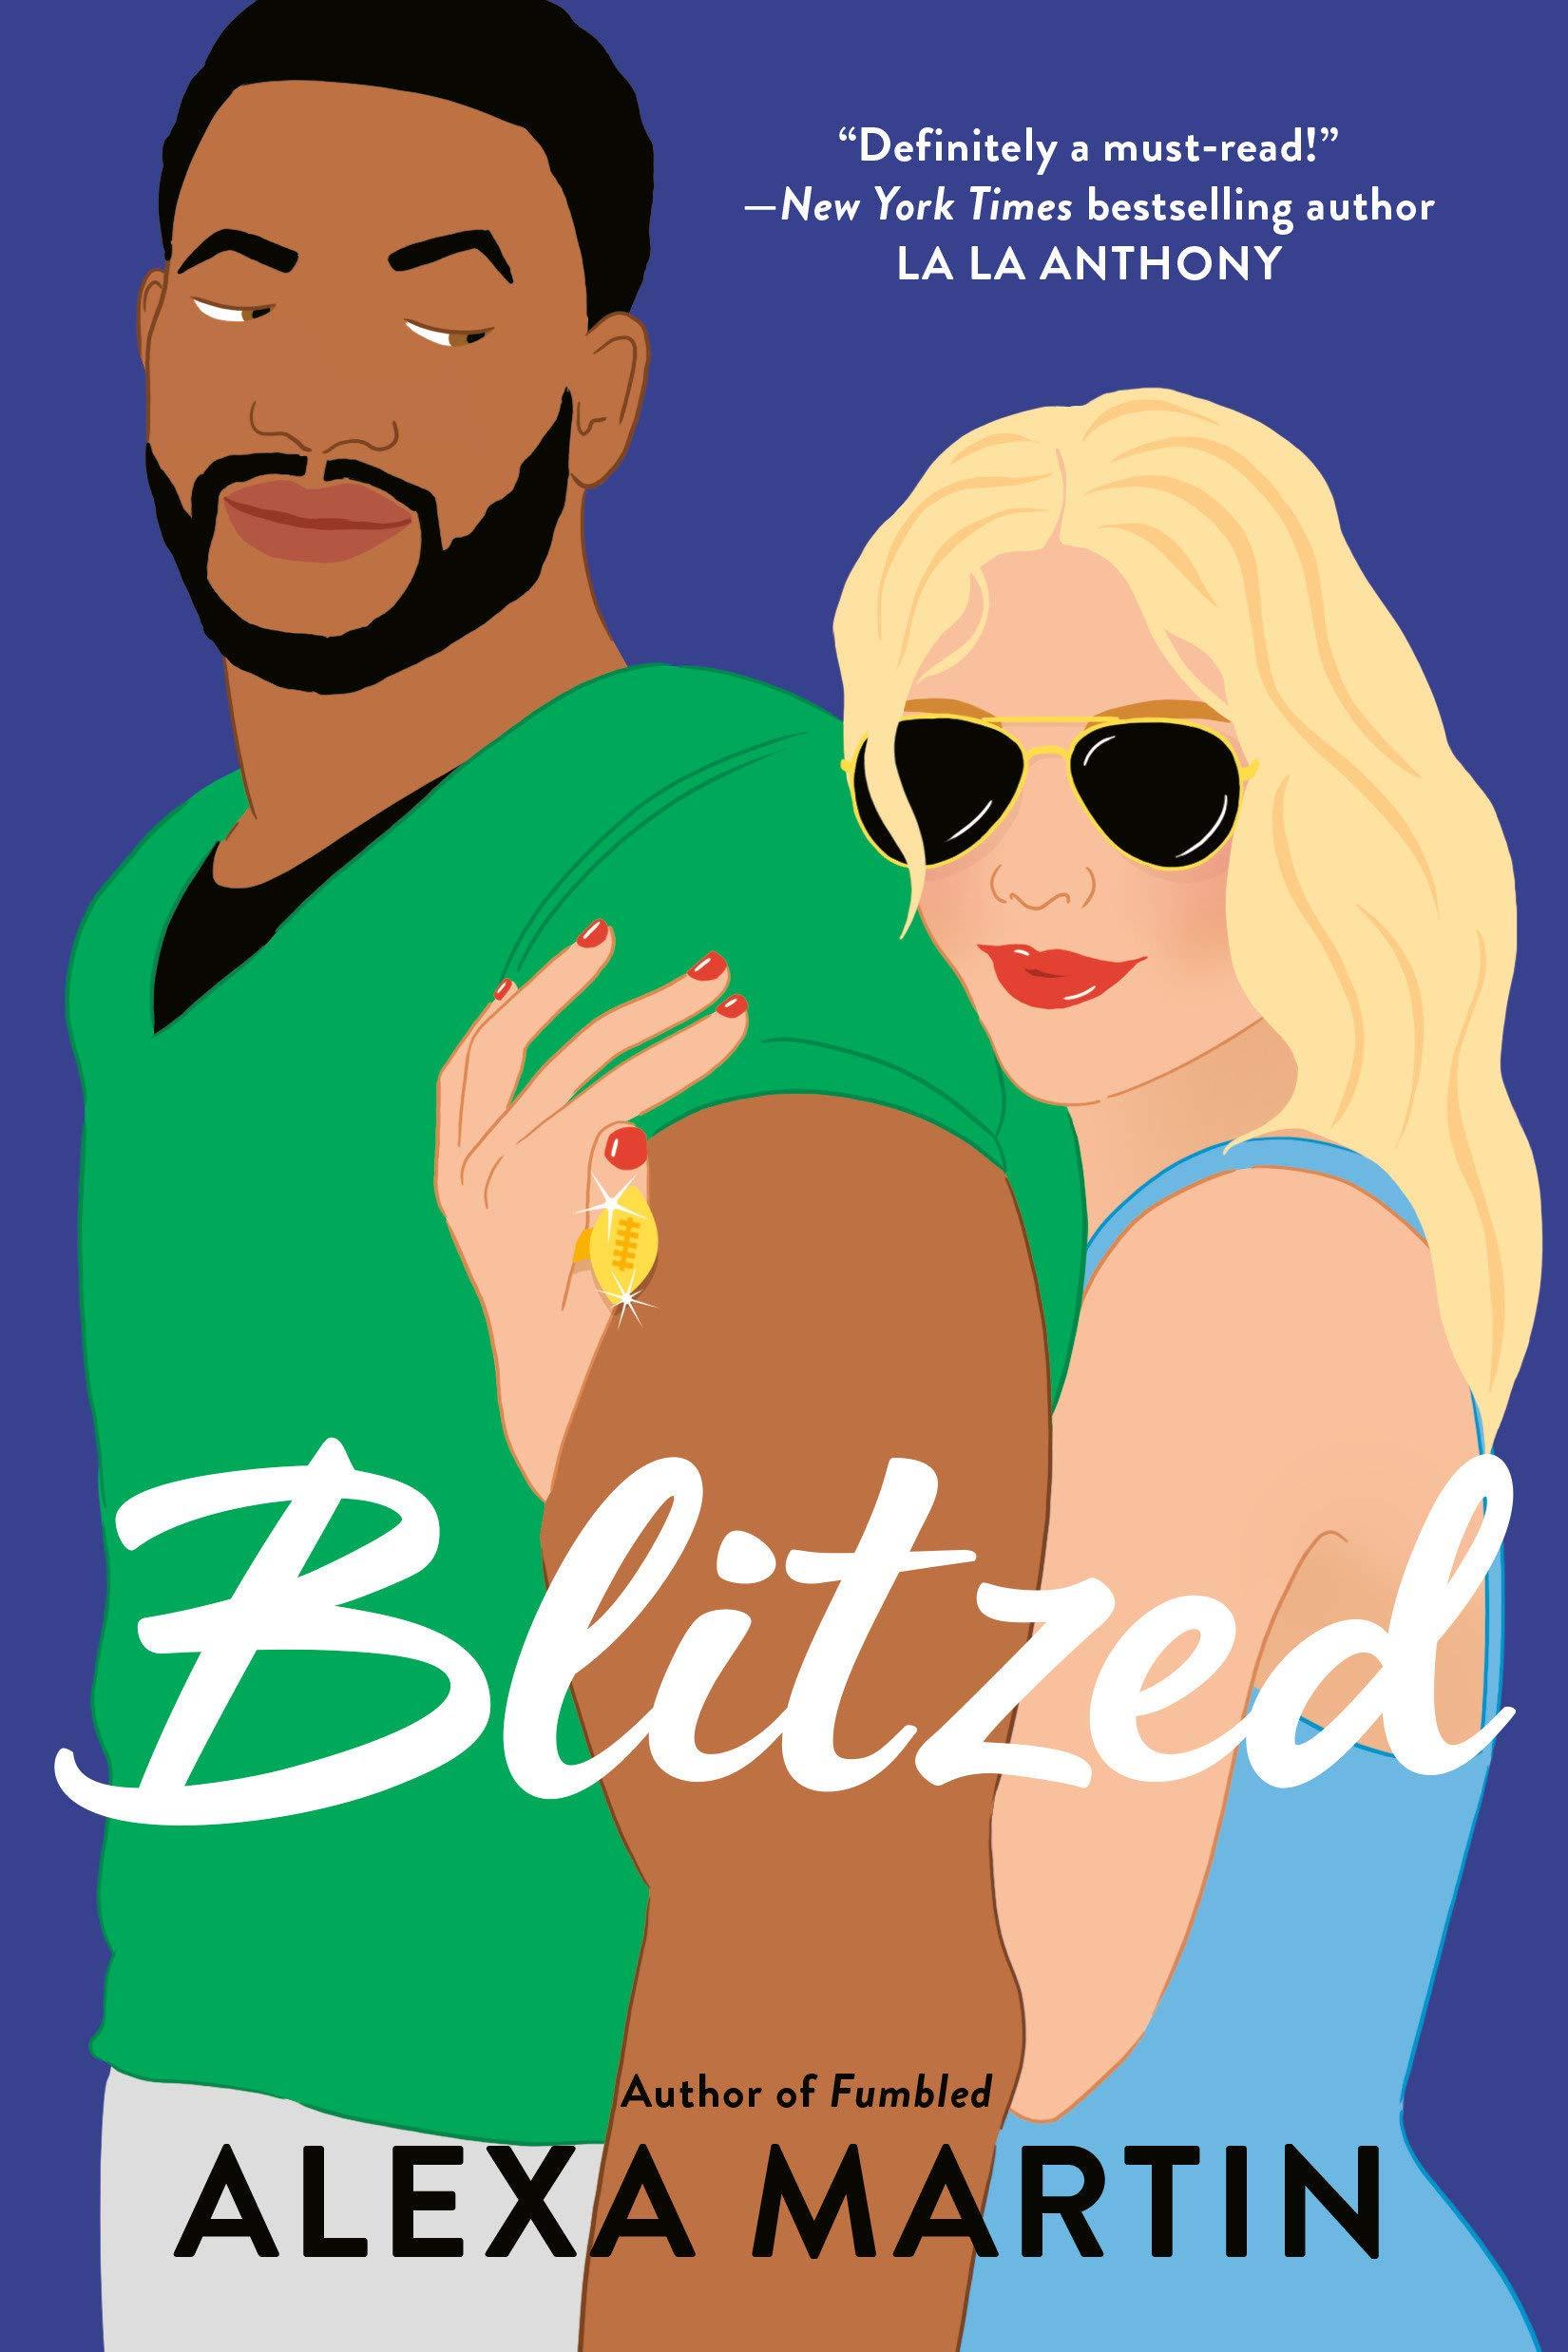 Amazon.com: Blitzed (Playbook, The) (9780451491992): Martin, Alexa: Books